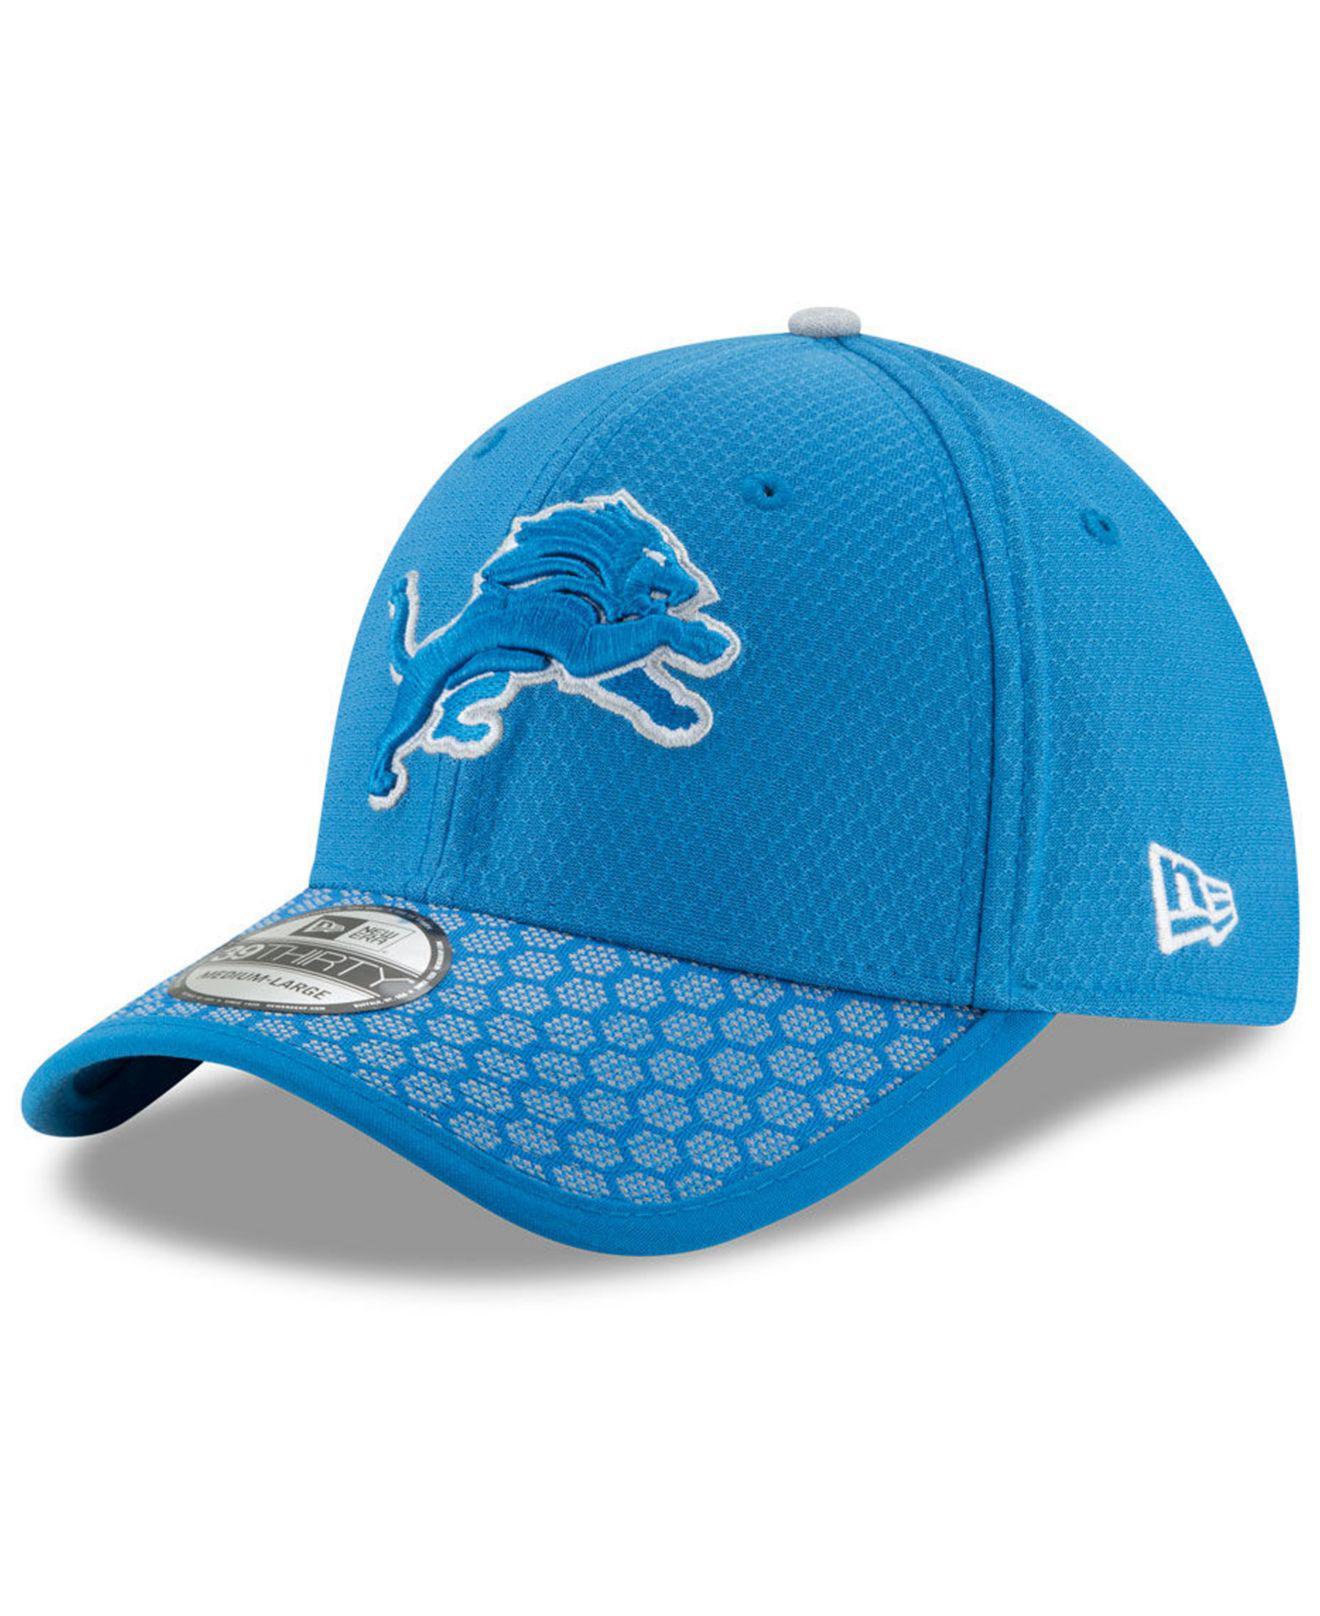 affda735721 Lyst - Ktz Sideline 39thirty Cap in Blue for Men